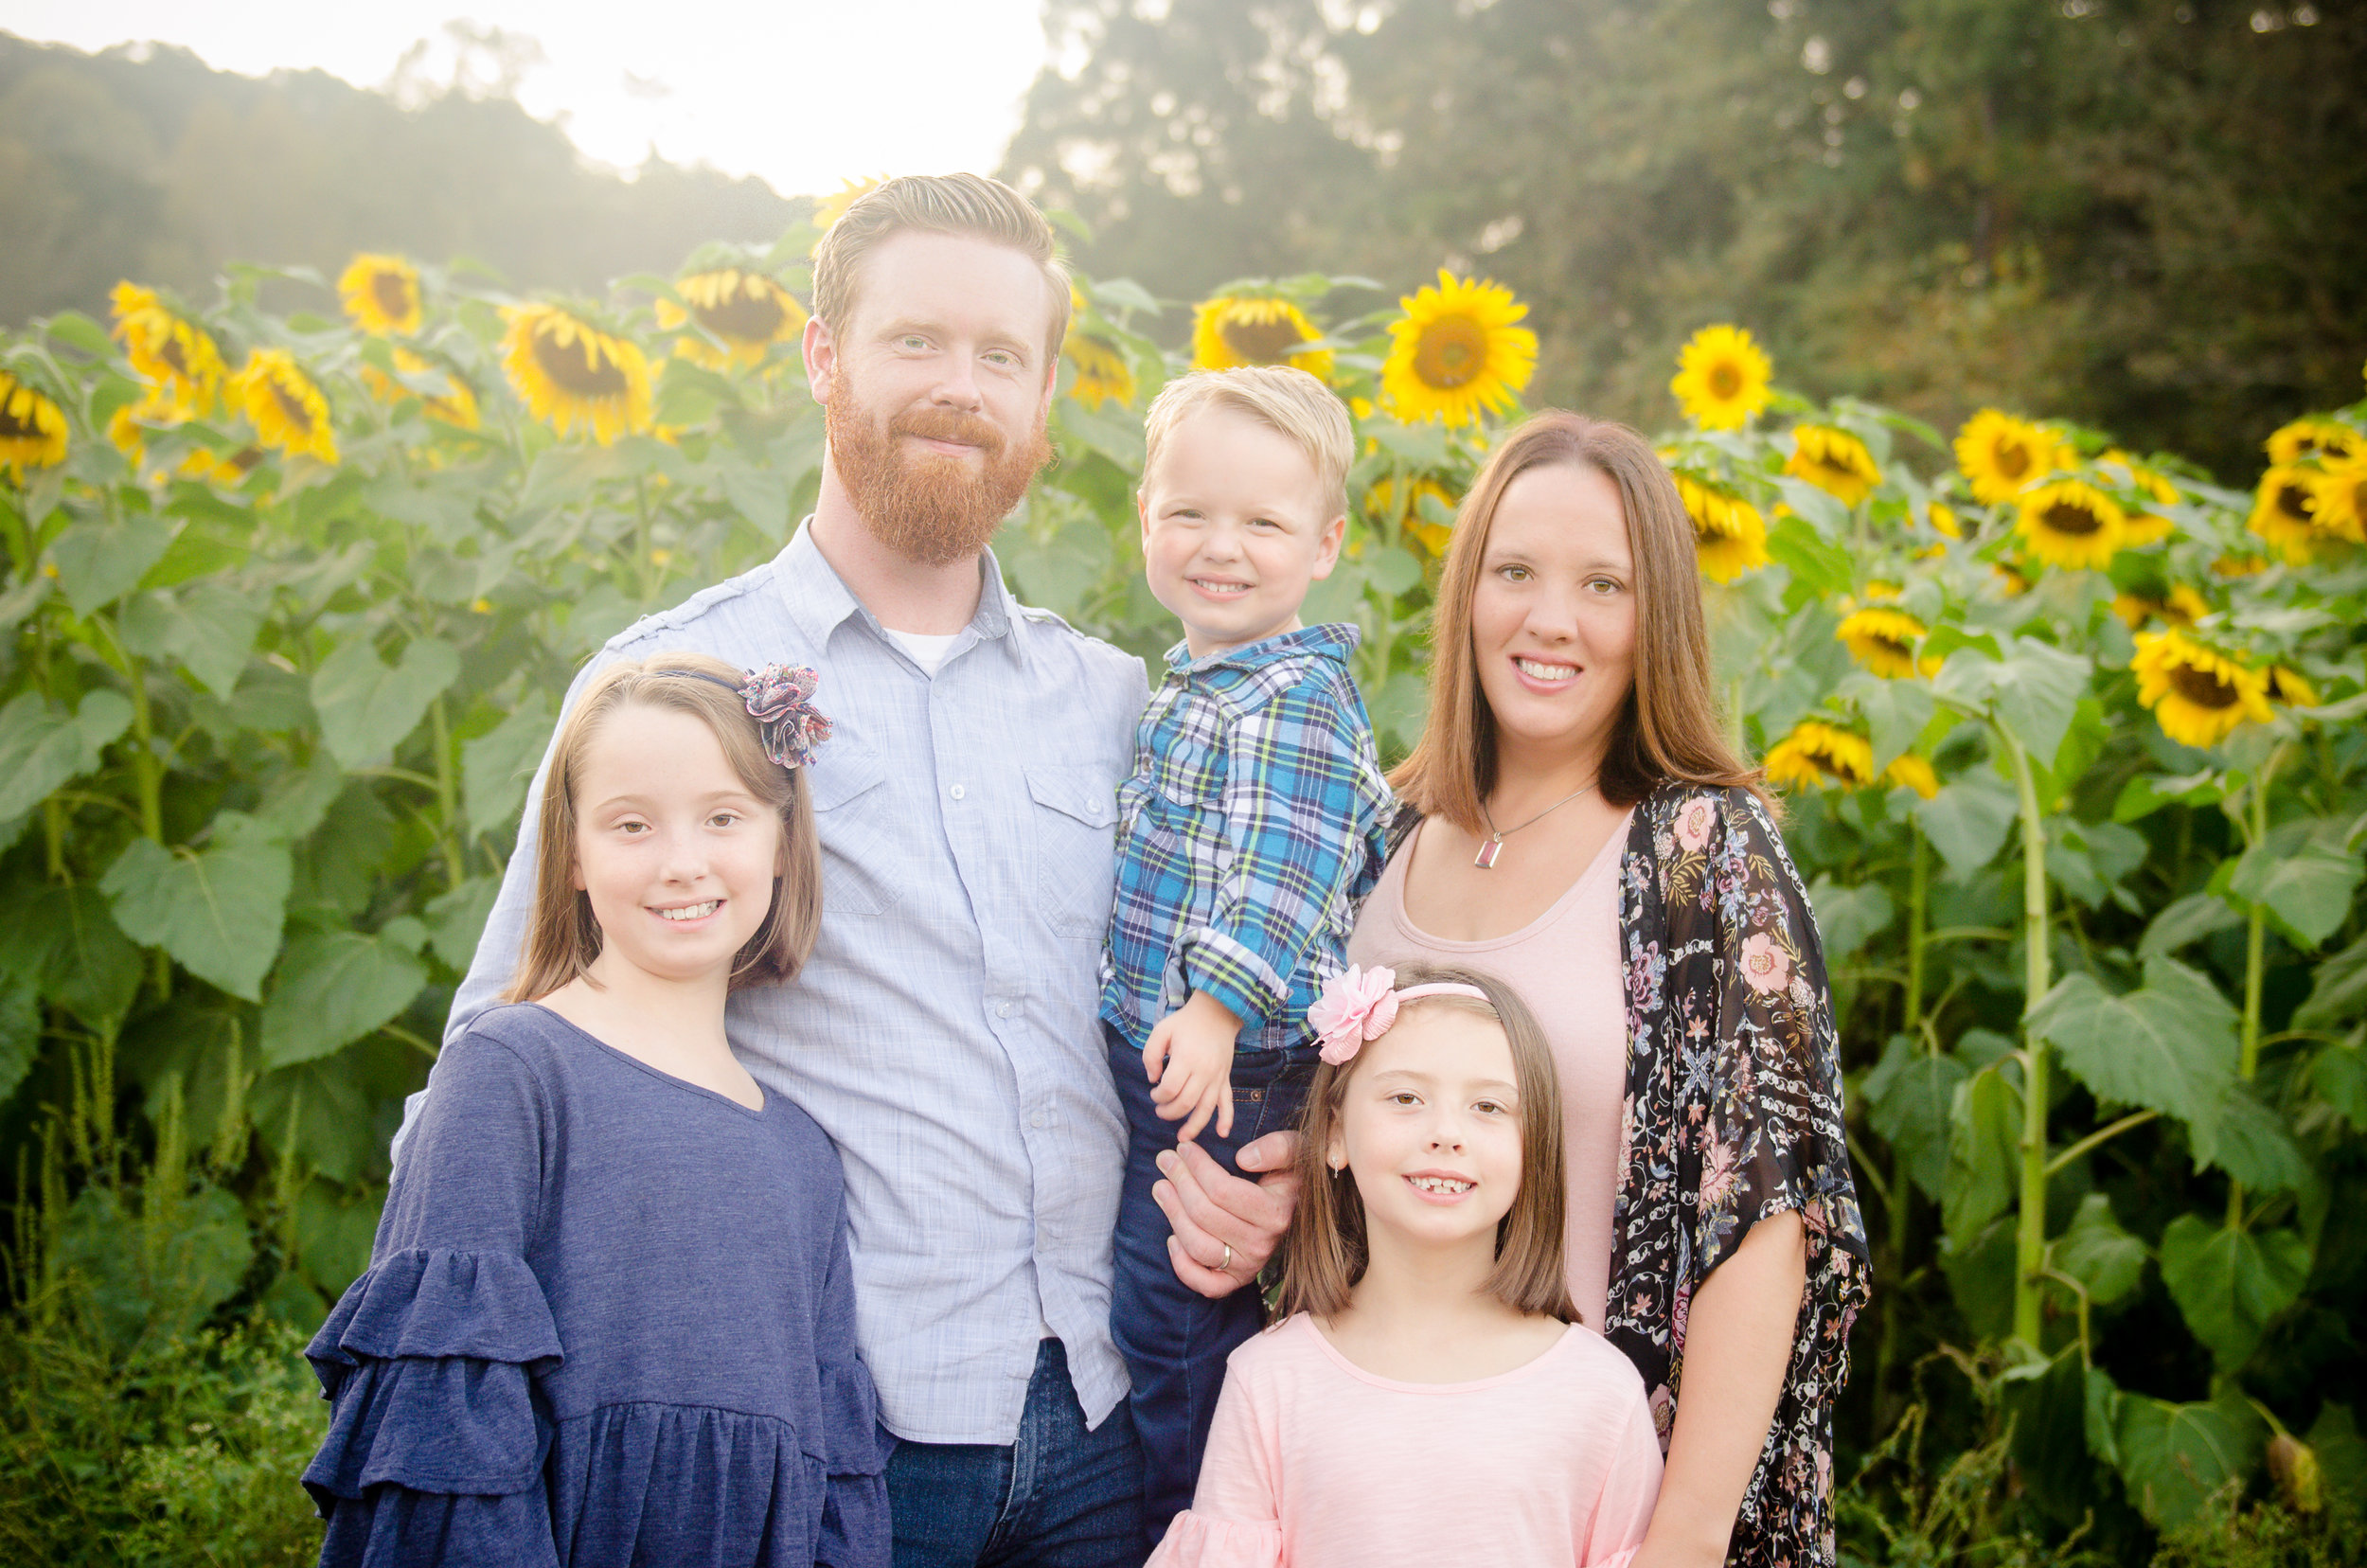 Lawleys_Sunflowers-4.jpg